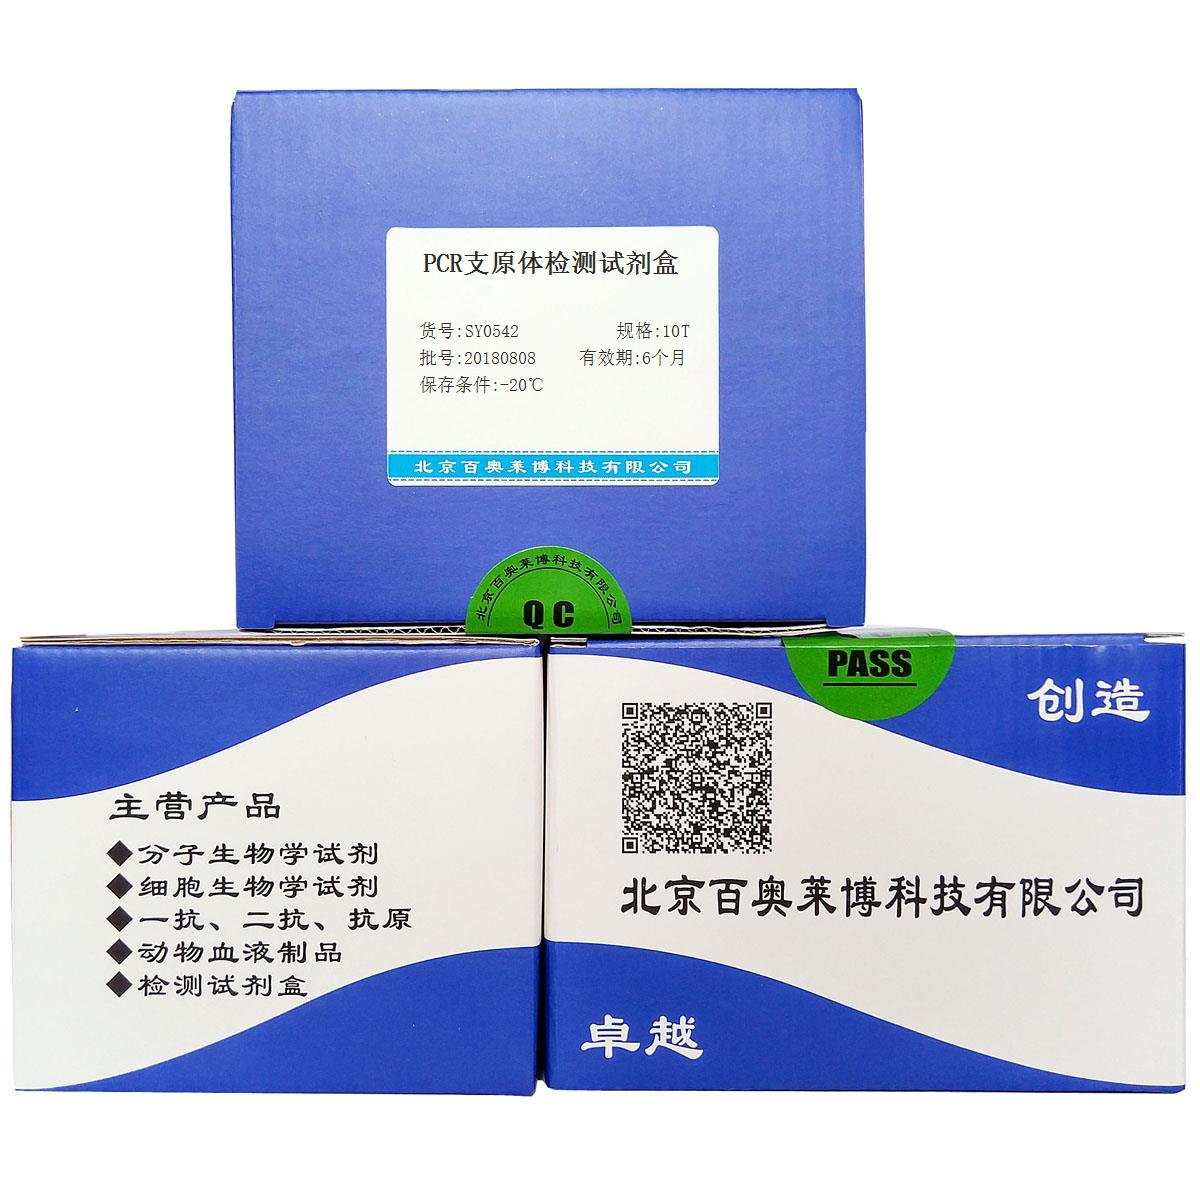 PCR支原体检测试剂盒